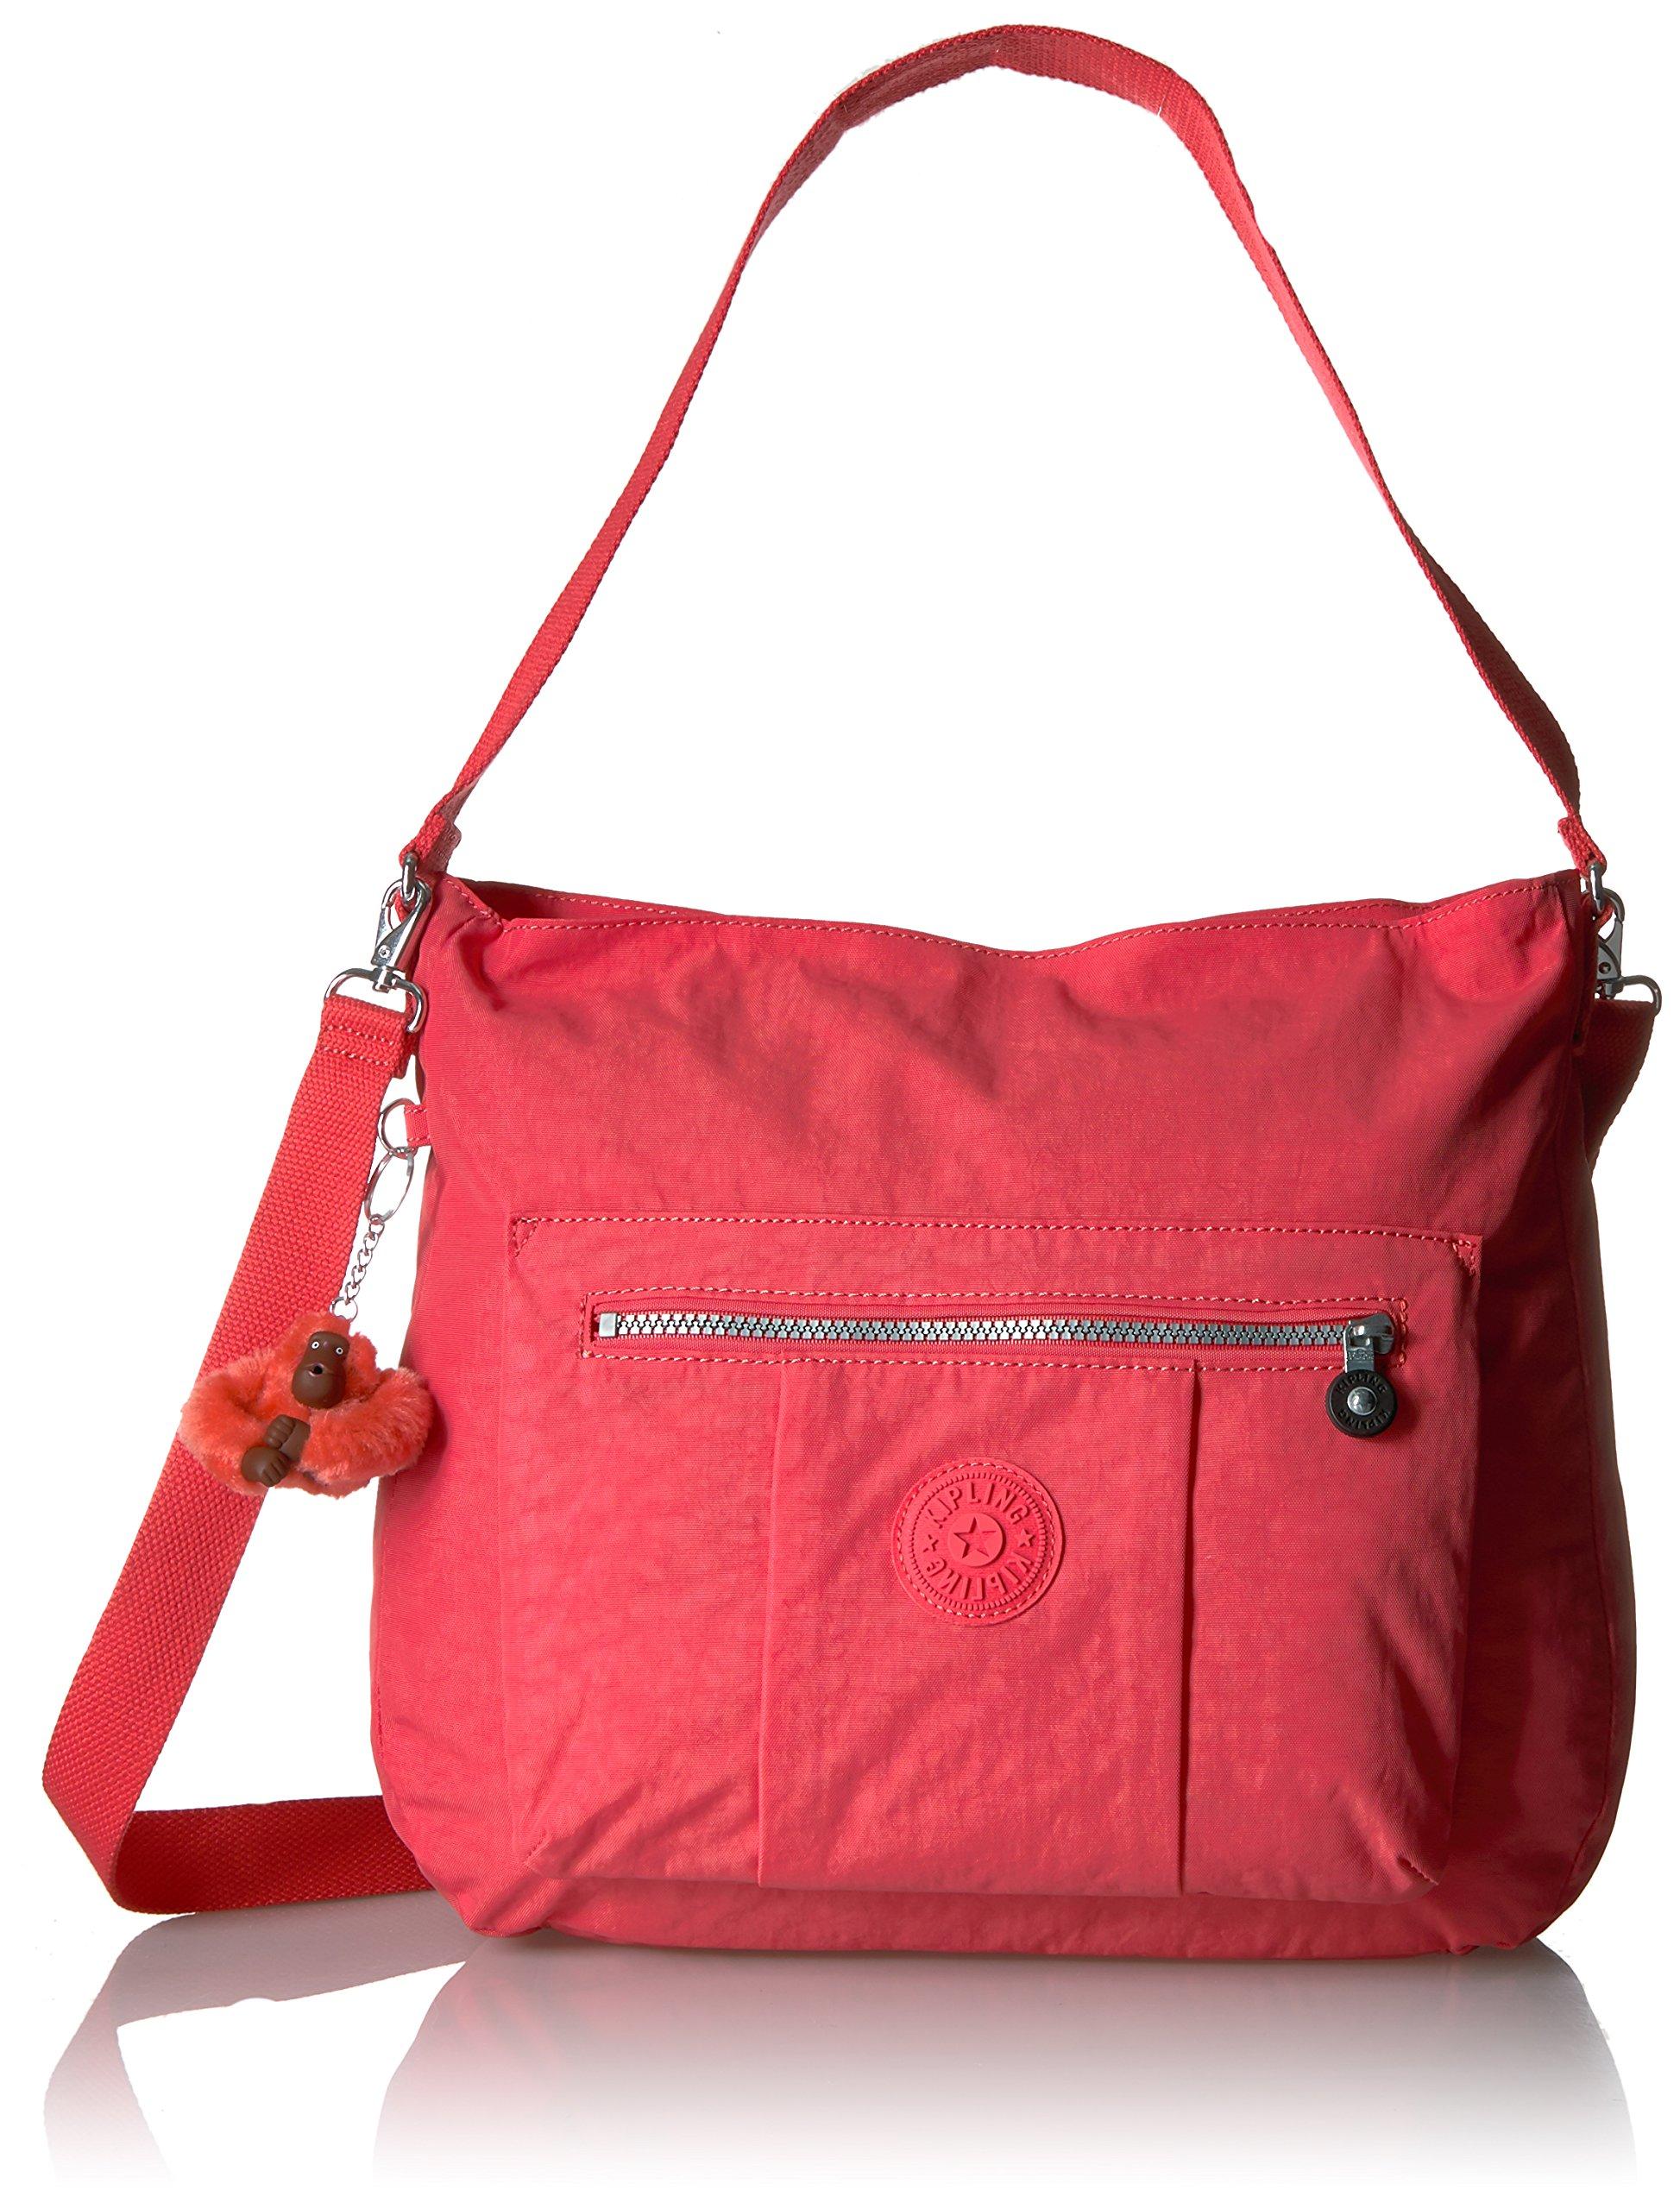 Kipling Carley Solid Hobo Crossbody Bag, Papaya